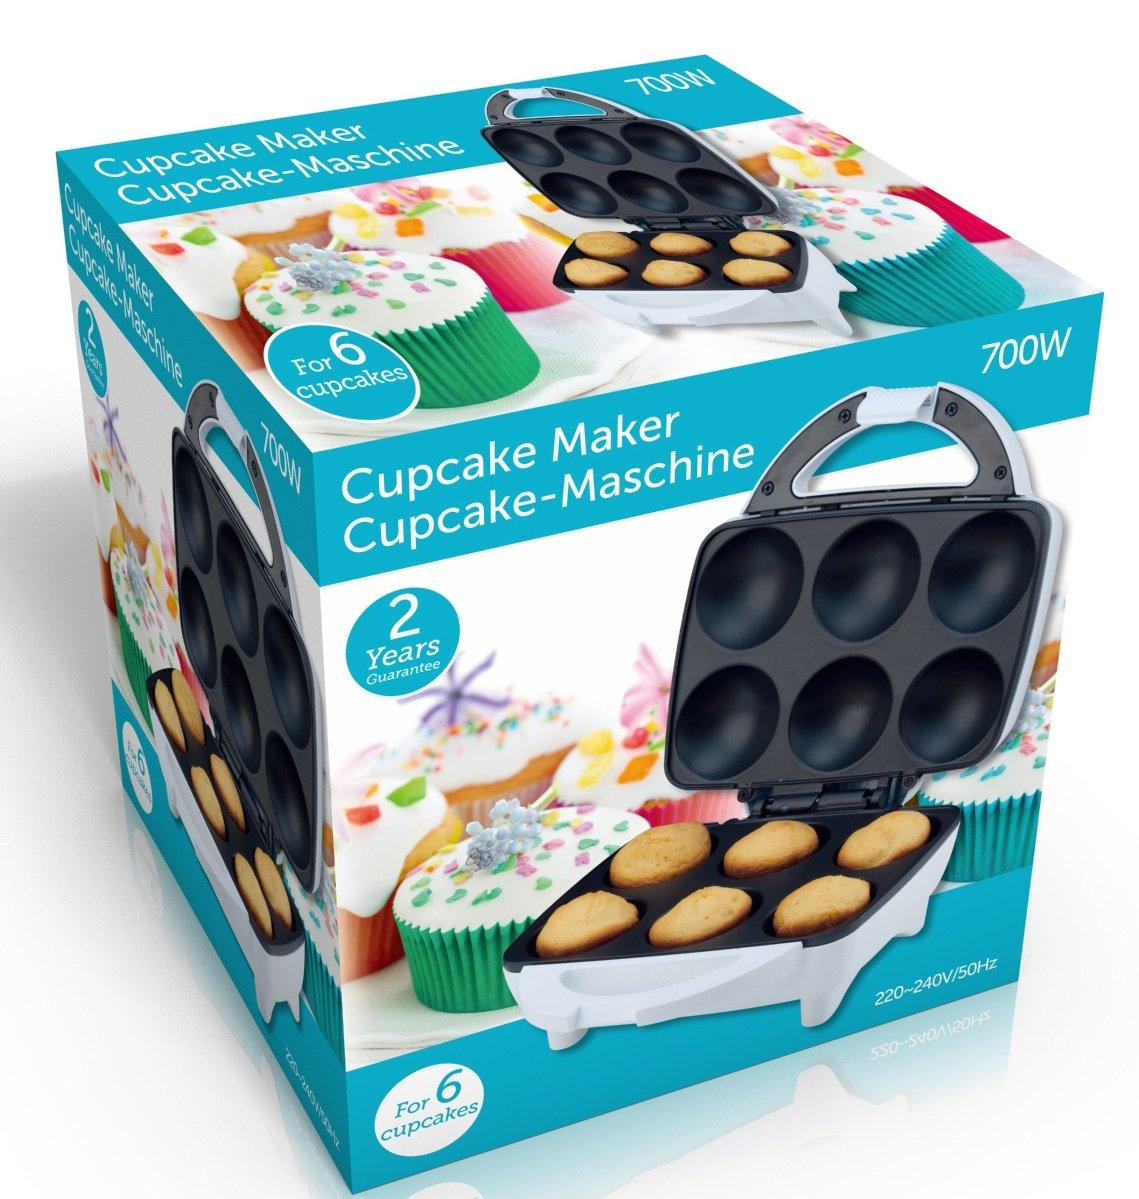 Macchina Piastra Elettrica Sforna Cupcake Tortini 6 Posti Prepara Dolci Muffin 700W Cupcake Maker GFK italia